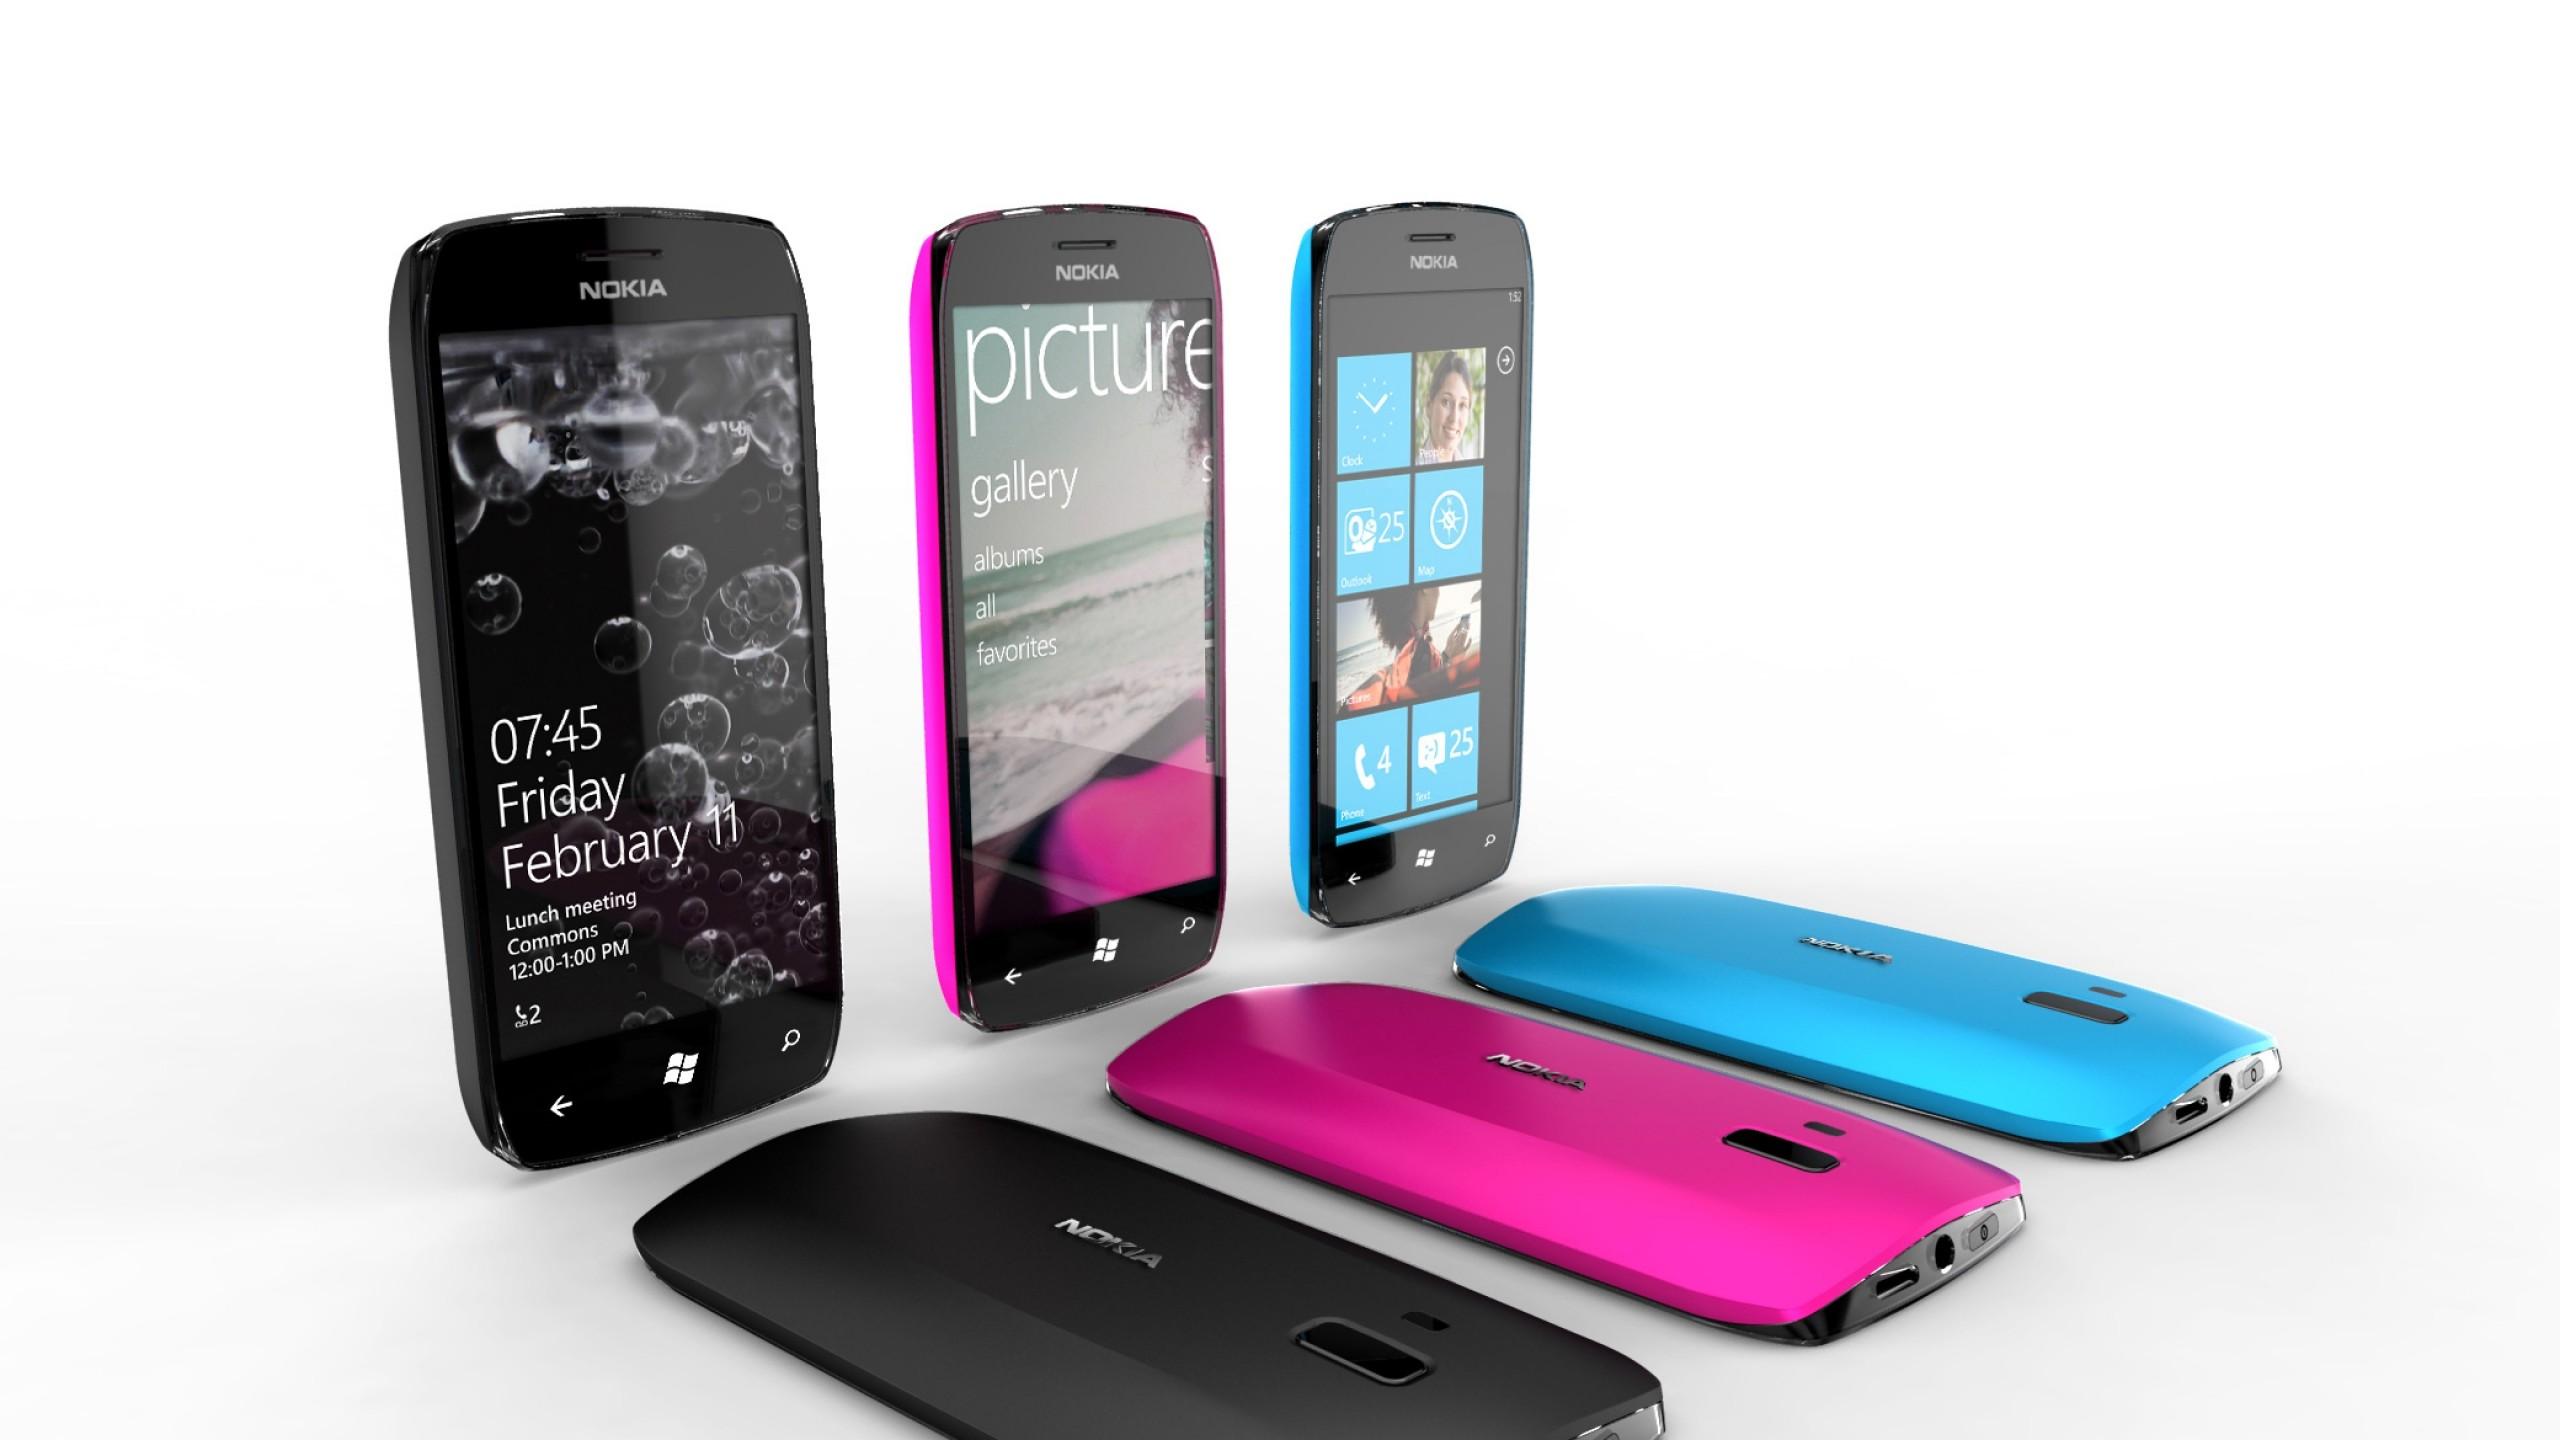 Wallpaper nokia, windows phone, concept, novelty, mobile phone,  smartphone